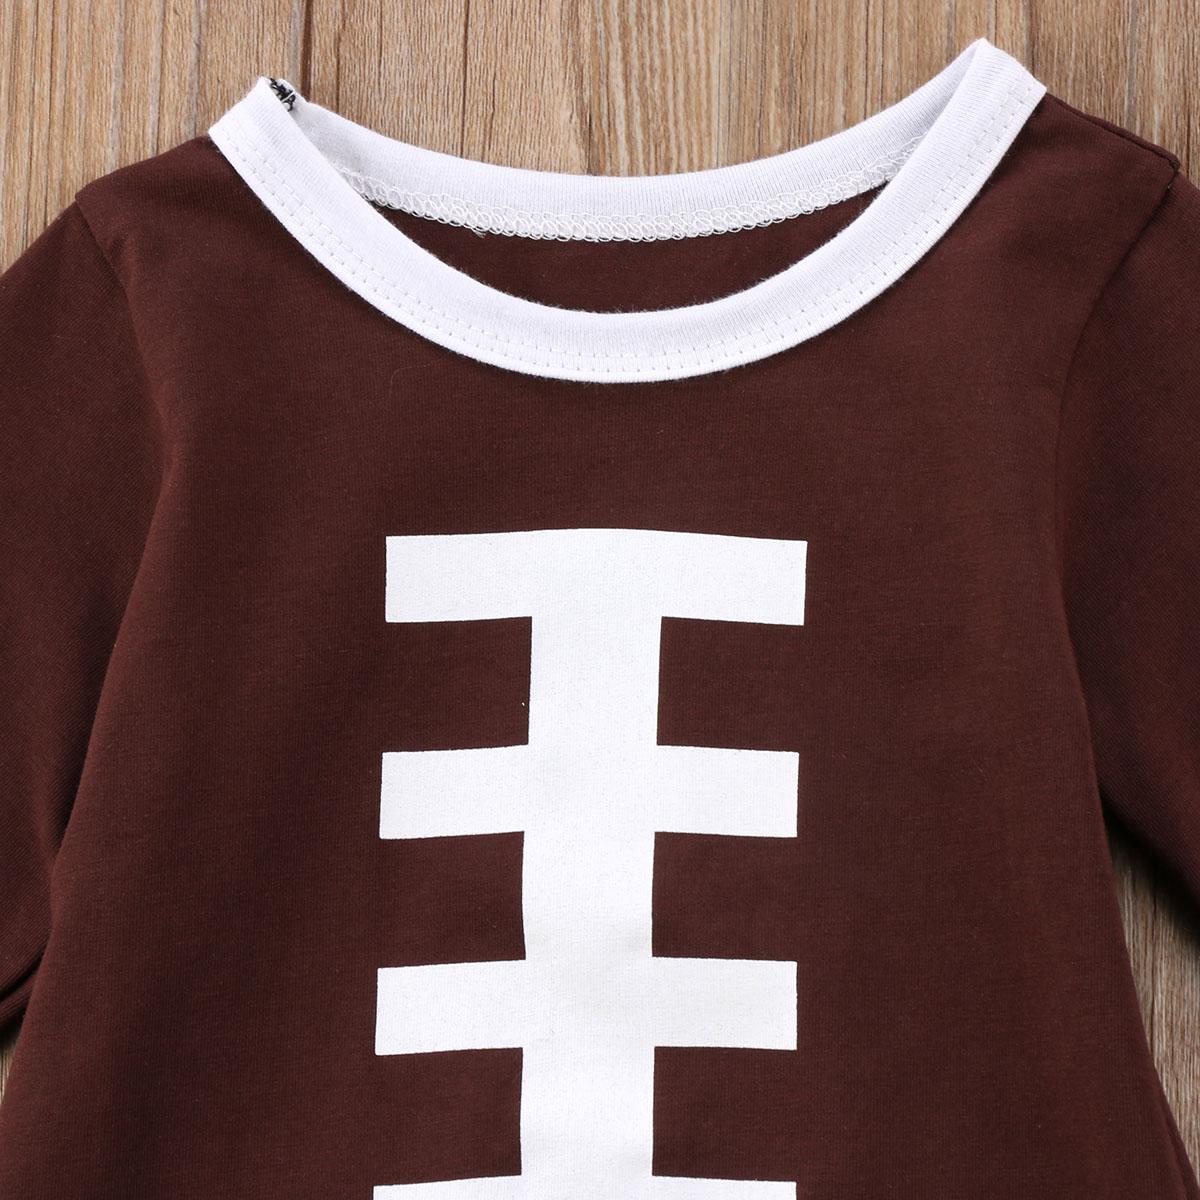 477a63279 Toddler Girl Brown Long Sleeve Shirt - DREAMWORKS